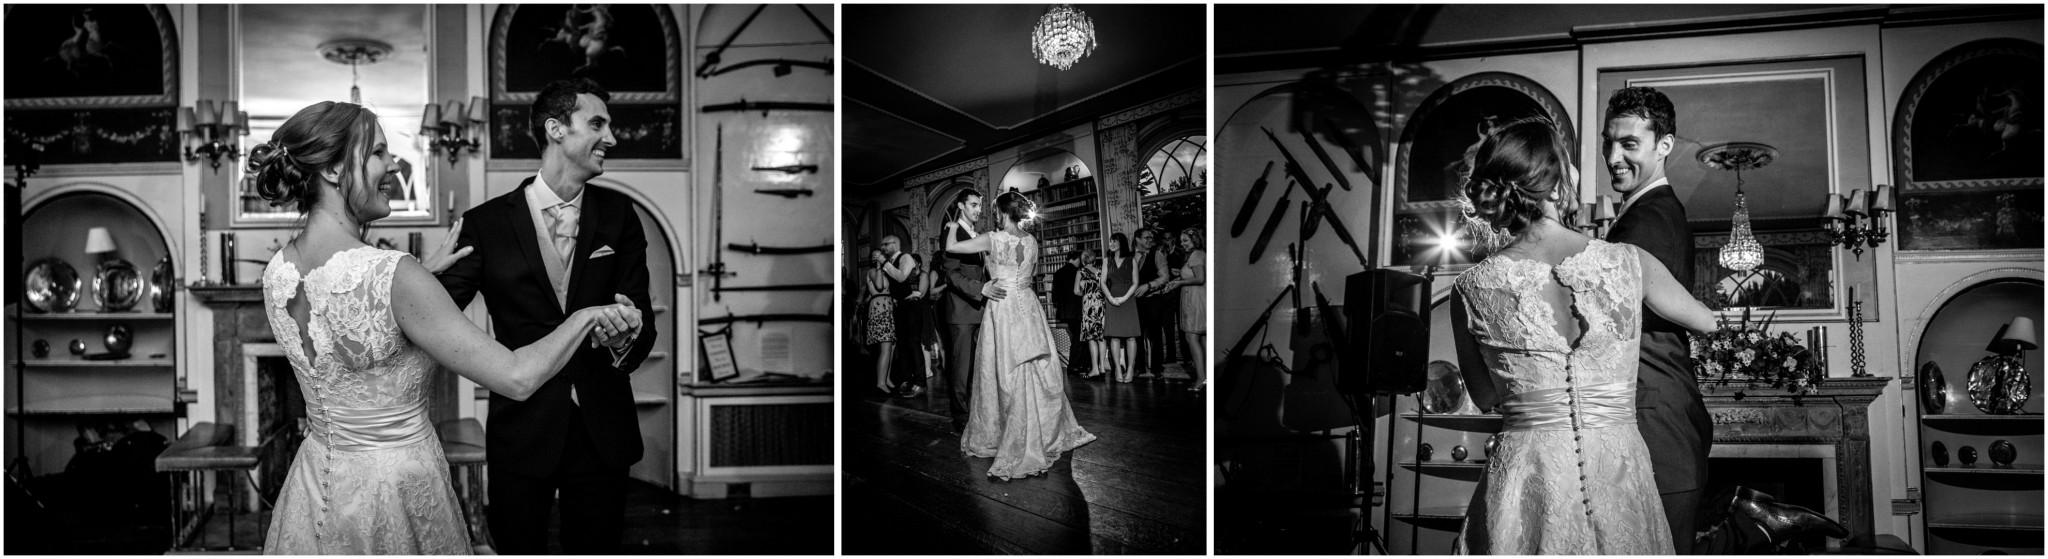 Avington Park Wedding Bride & Groom First Dance